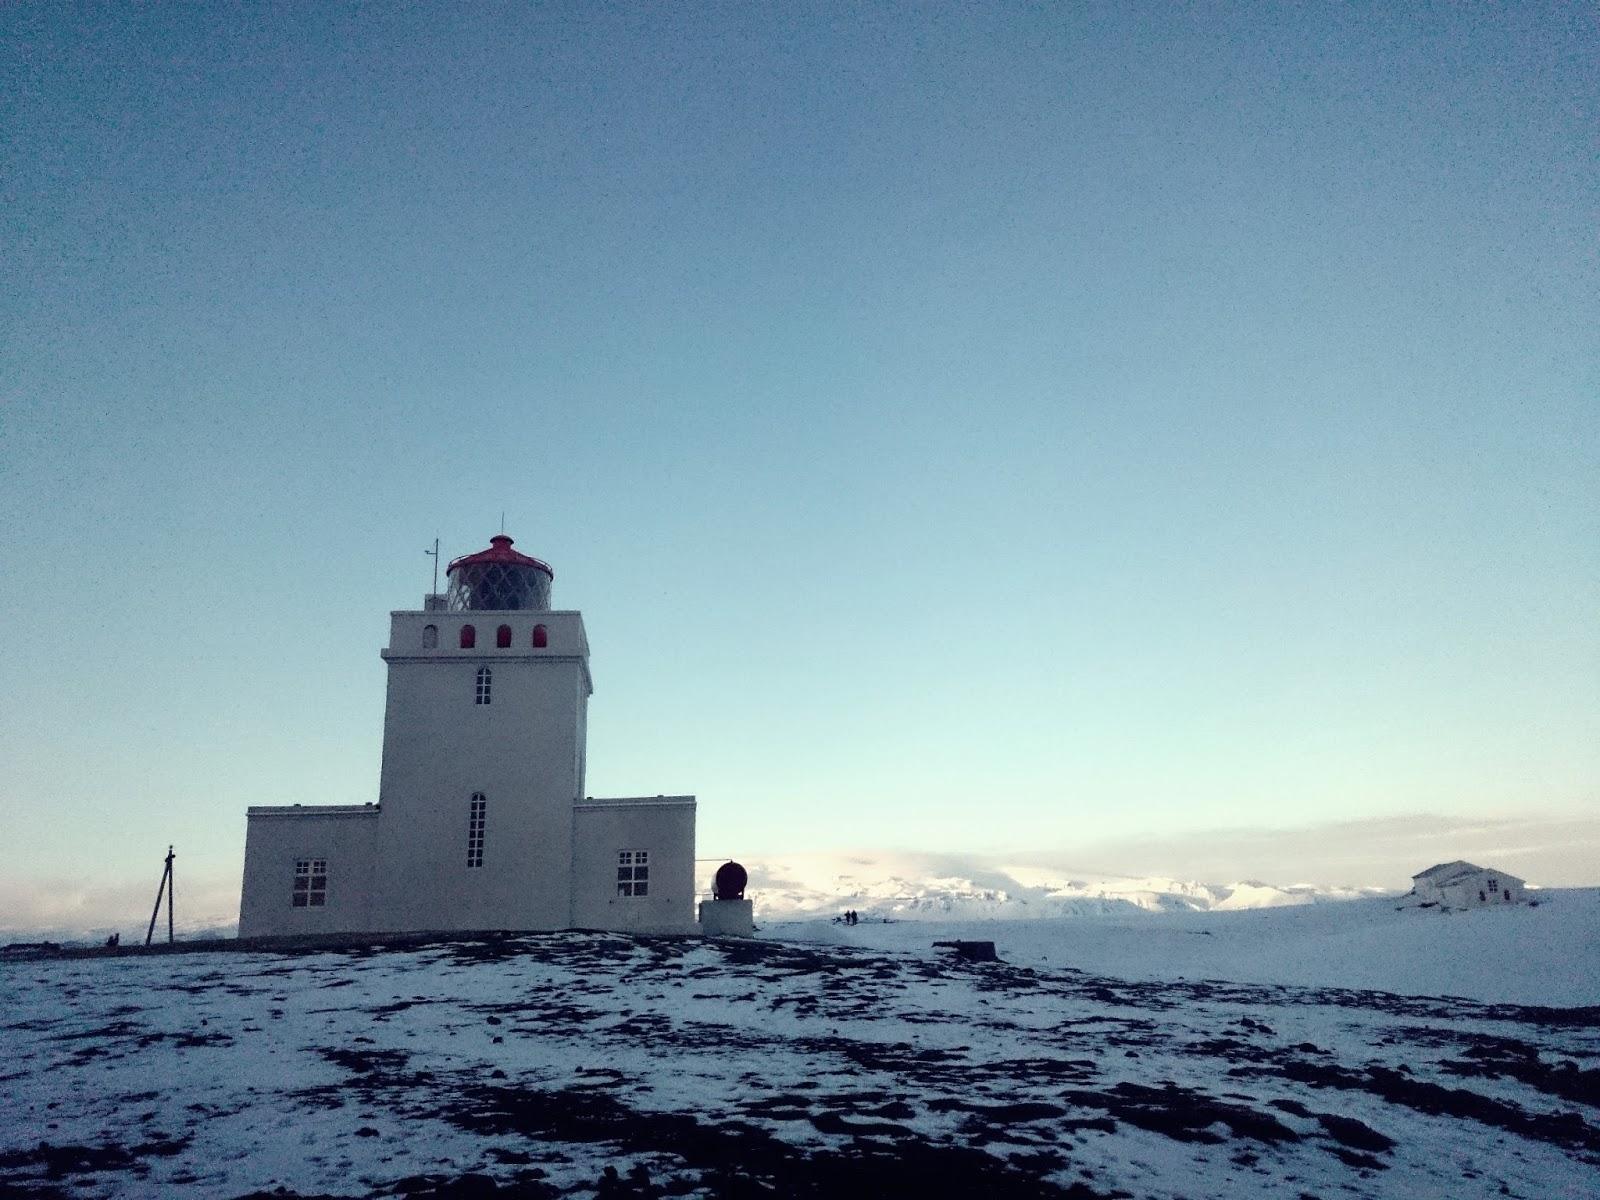 Latarnia na Dyrholaey, latarnia morska, Dyrholaey, Islandia, panidorcia, blog o Islandii